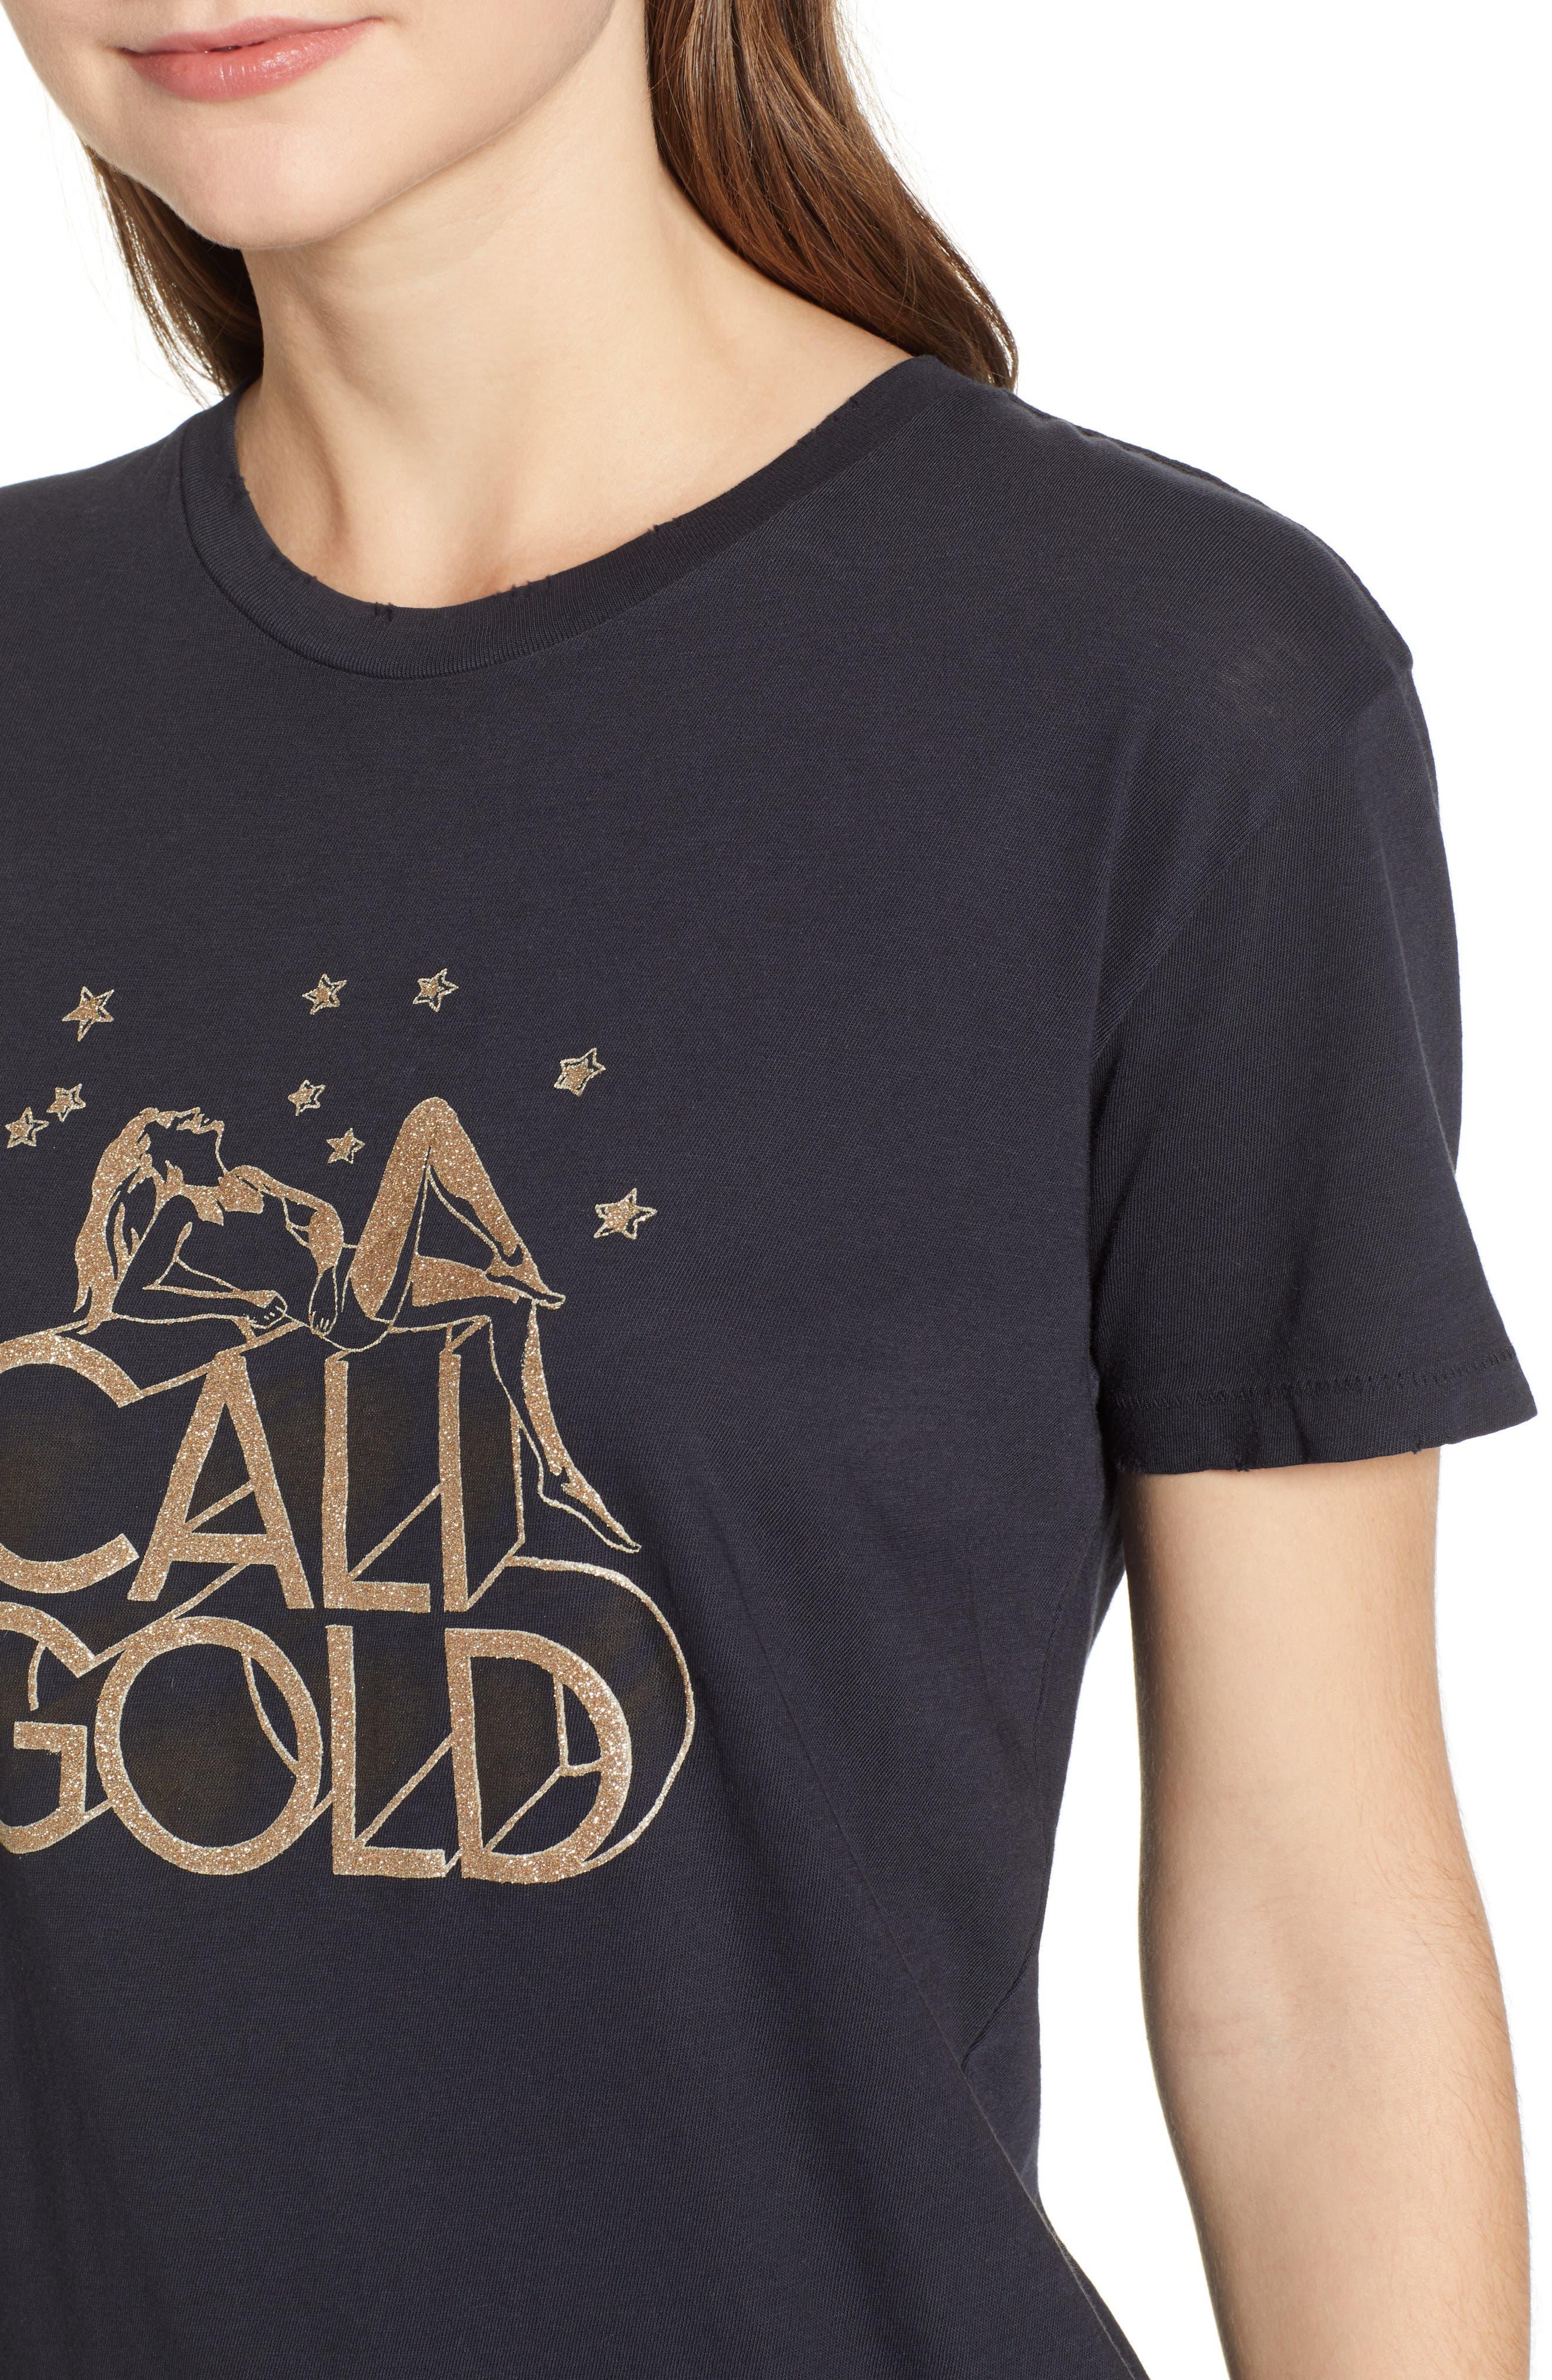 Cali Gold Tee,                             Alternate thumbnail 4, color,                             FADED BLACK